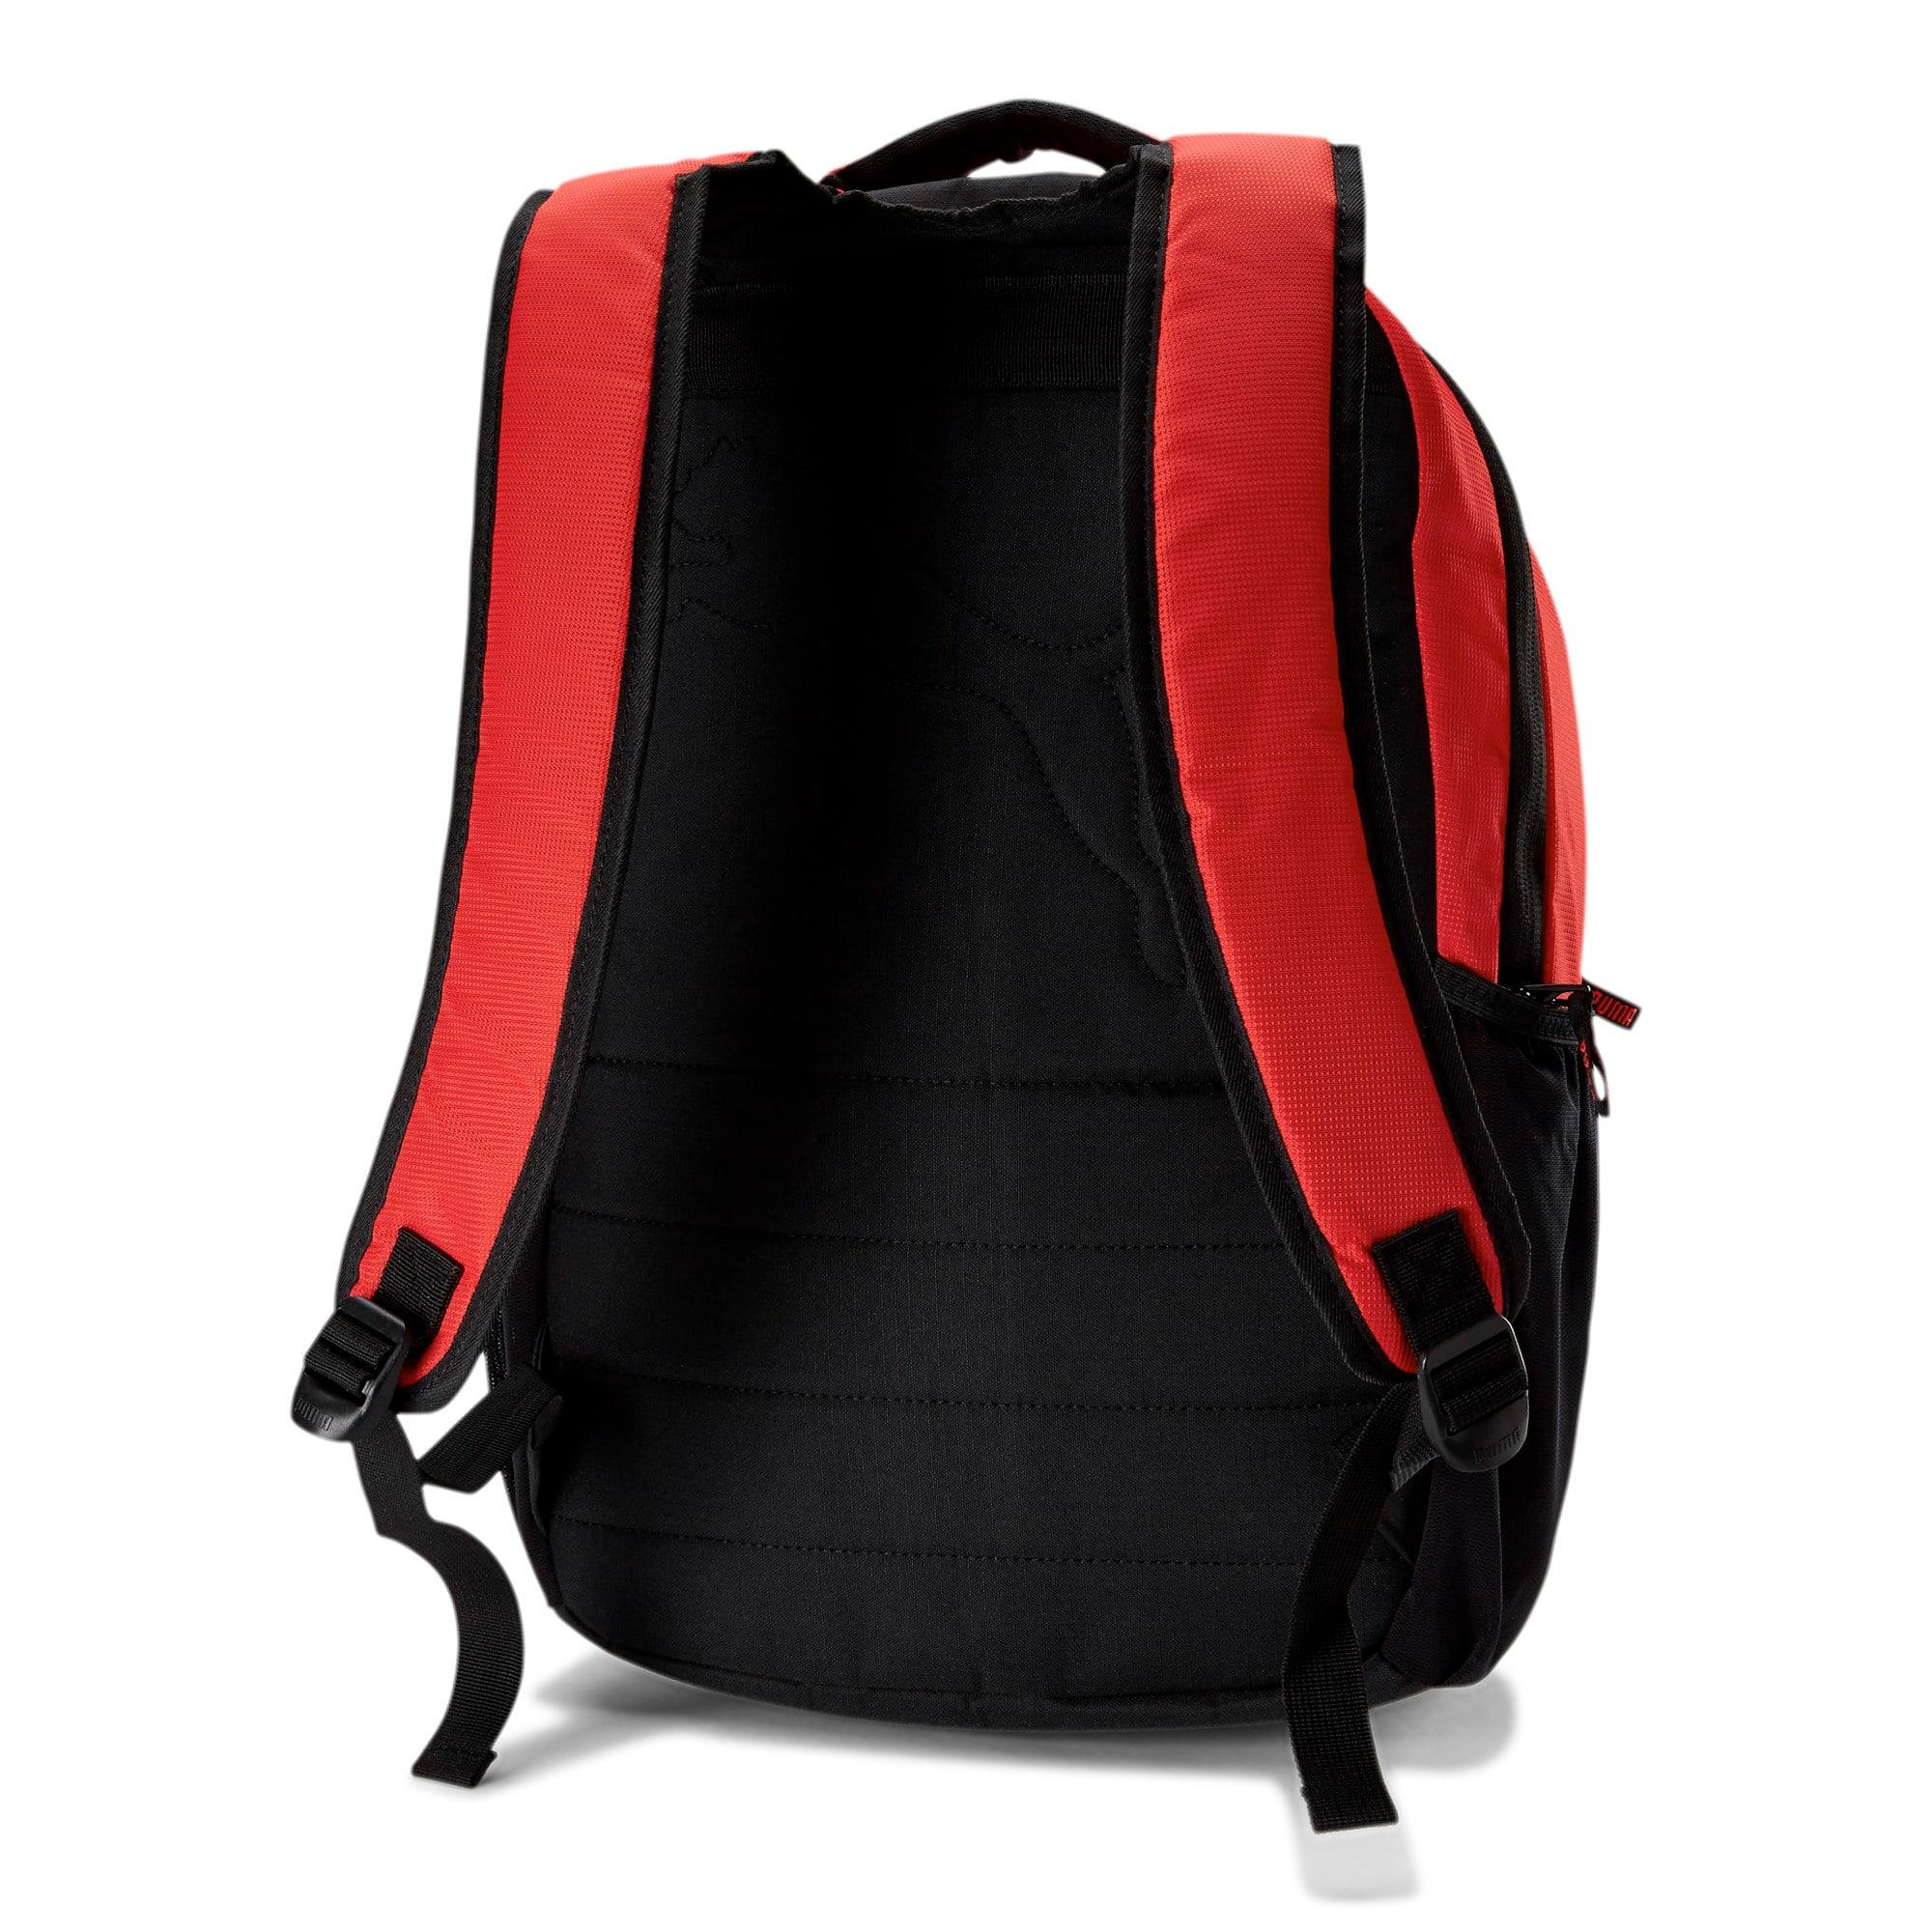 Thumbnail 2 of Formation 2.0 Ball Backpack, Medium Red, medium